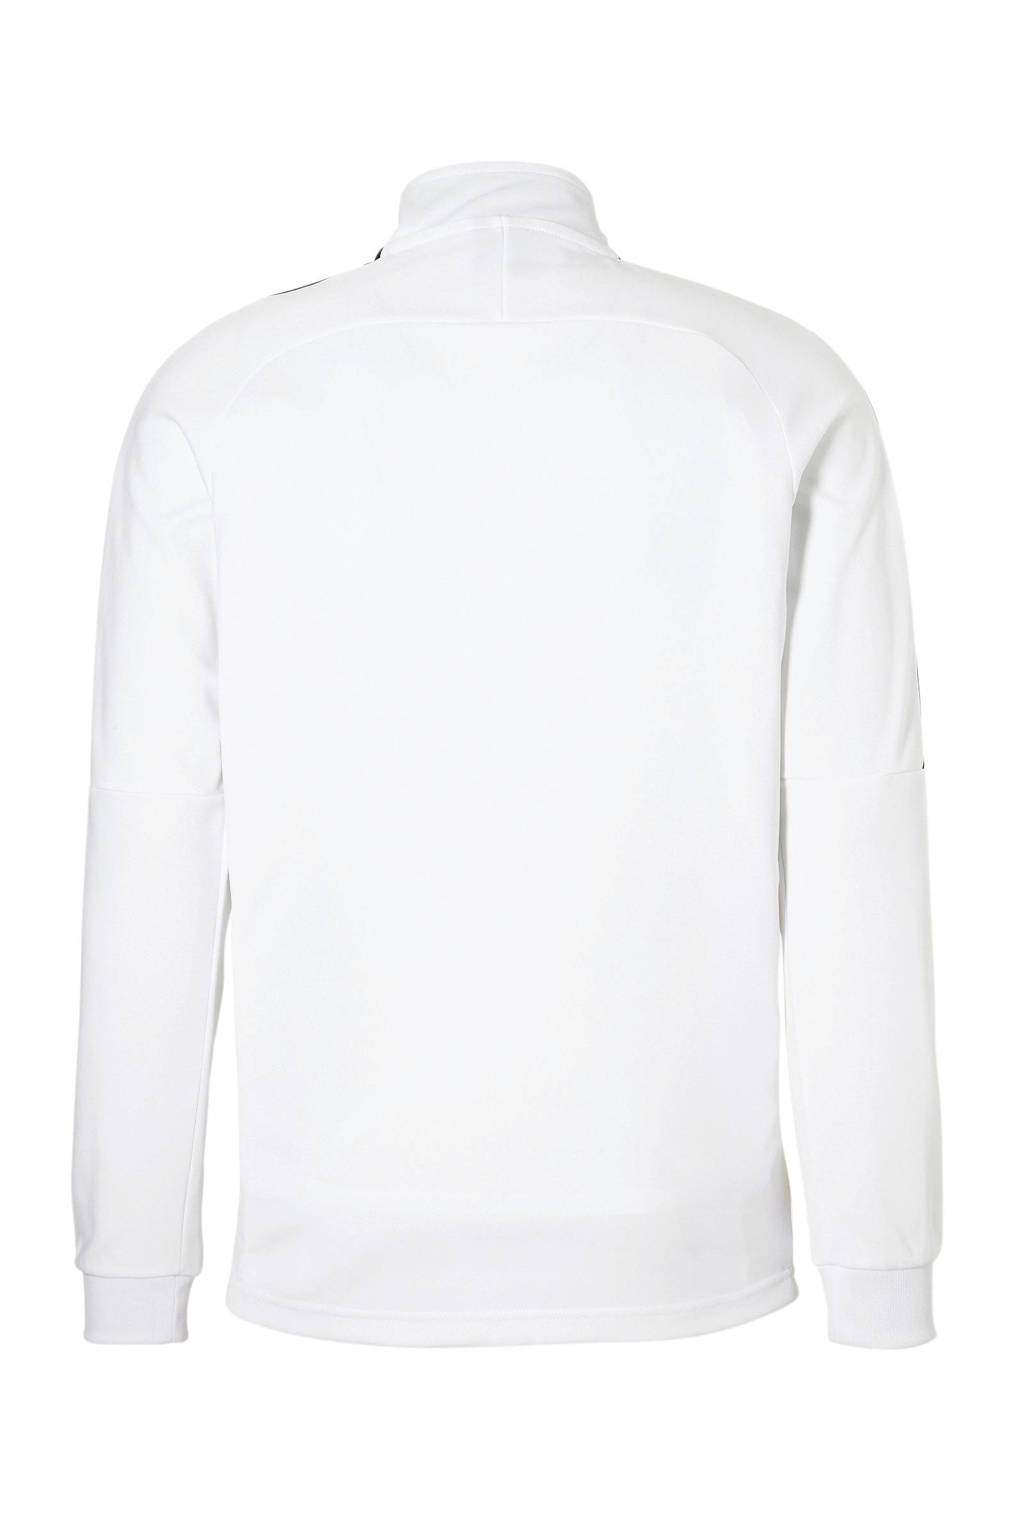 Nike   sportvest wit, Wit